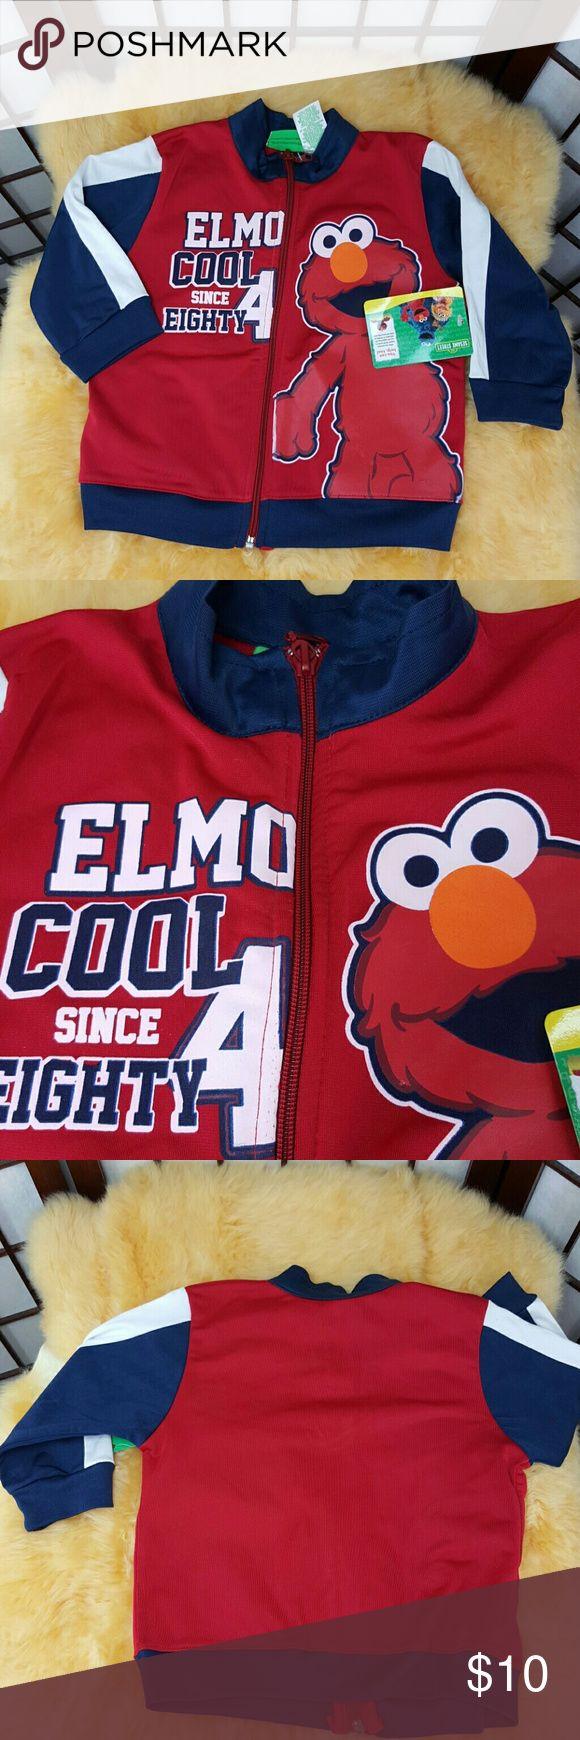 Elmo Cool Sesame Street Zip Up Jacket Sz 2T New with tags Sesame Street size 2T Elmo Cool since eighty 4 Red zip up jacket Made of 100% polyester Sesame Street Jackets & Coats